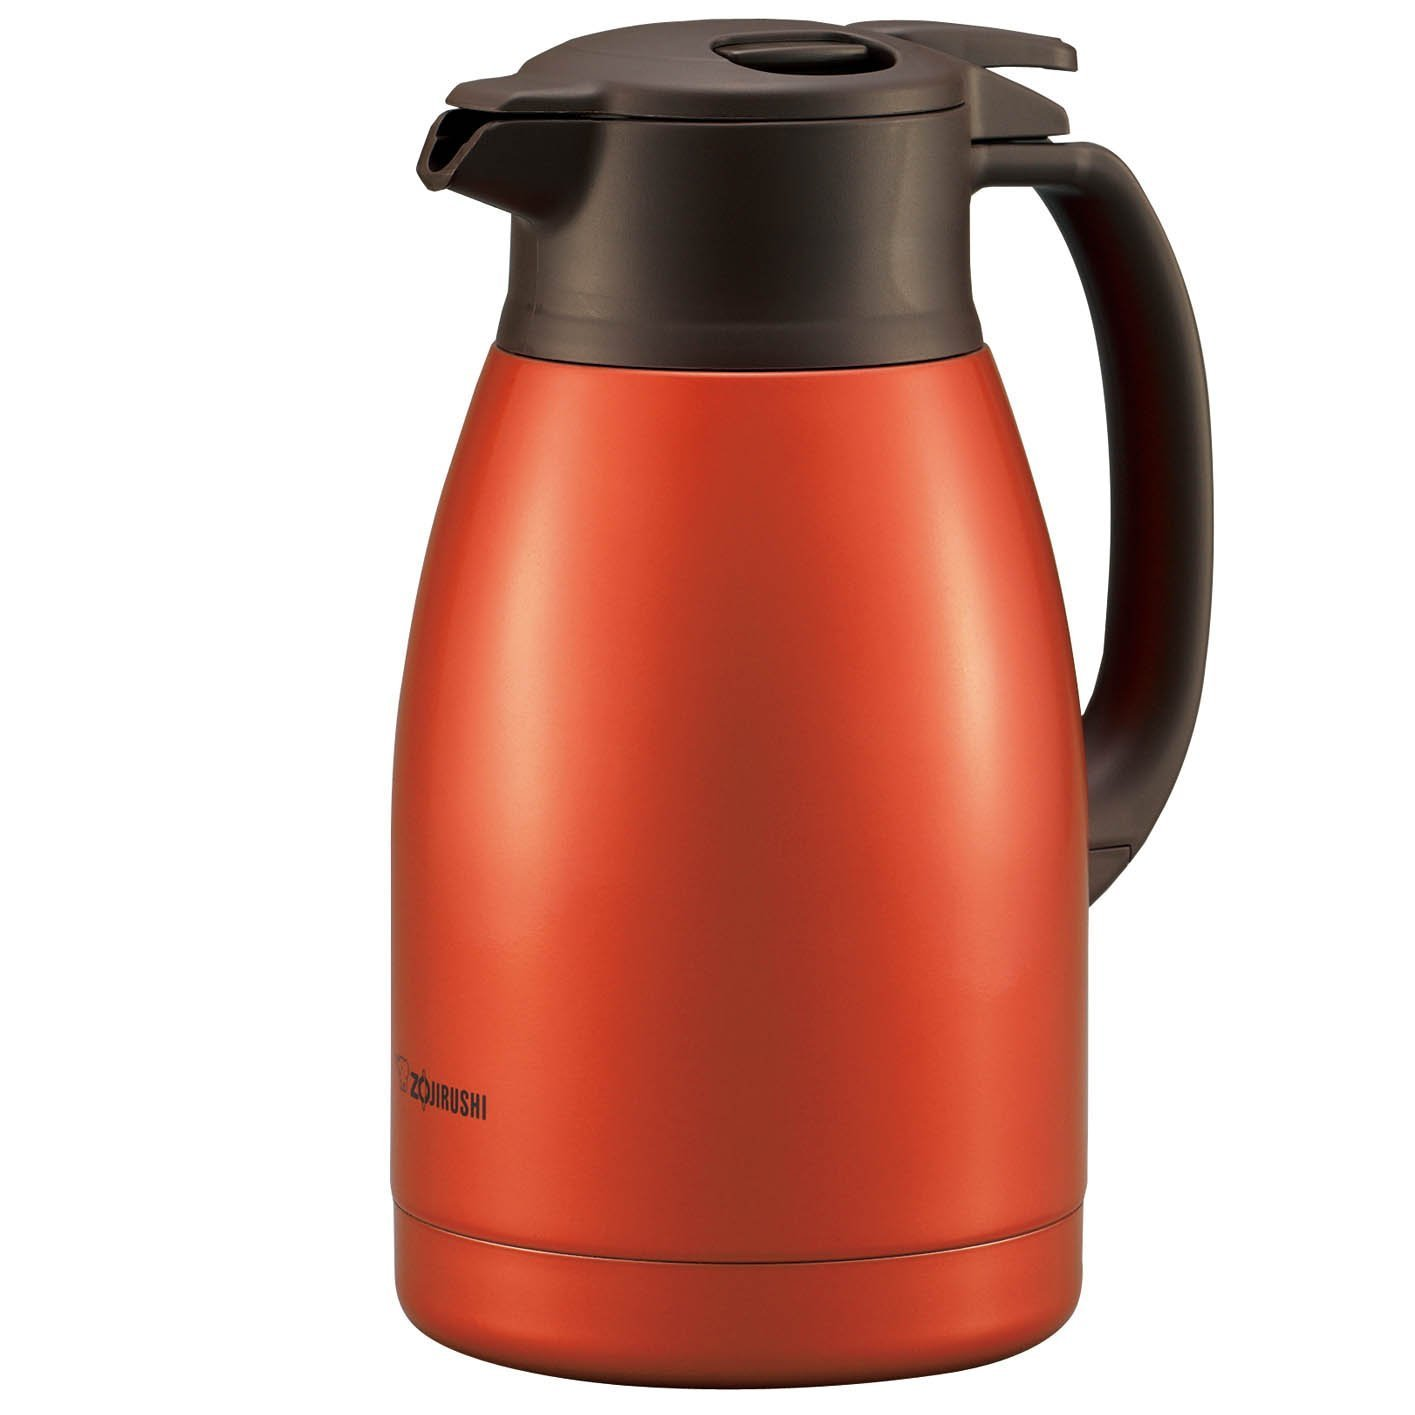 Zojirushi Stainless Steel Warm Pot SH-HA15-DB Orange from JAPAN NEW